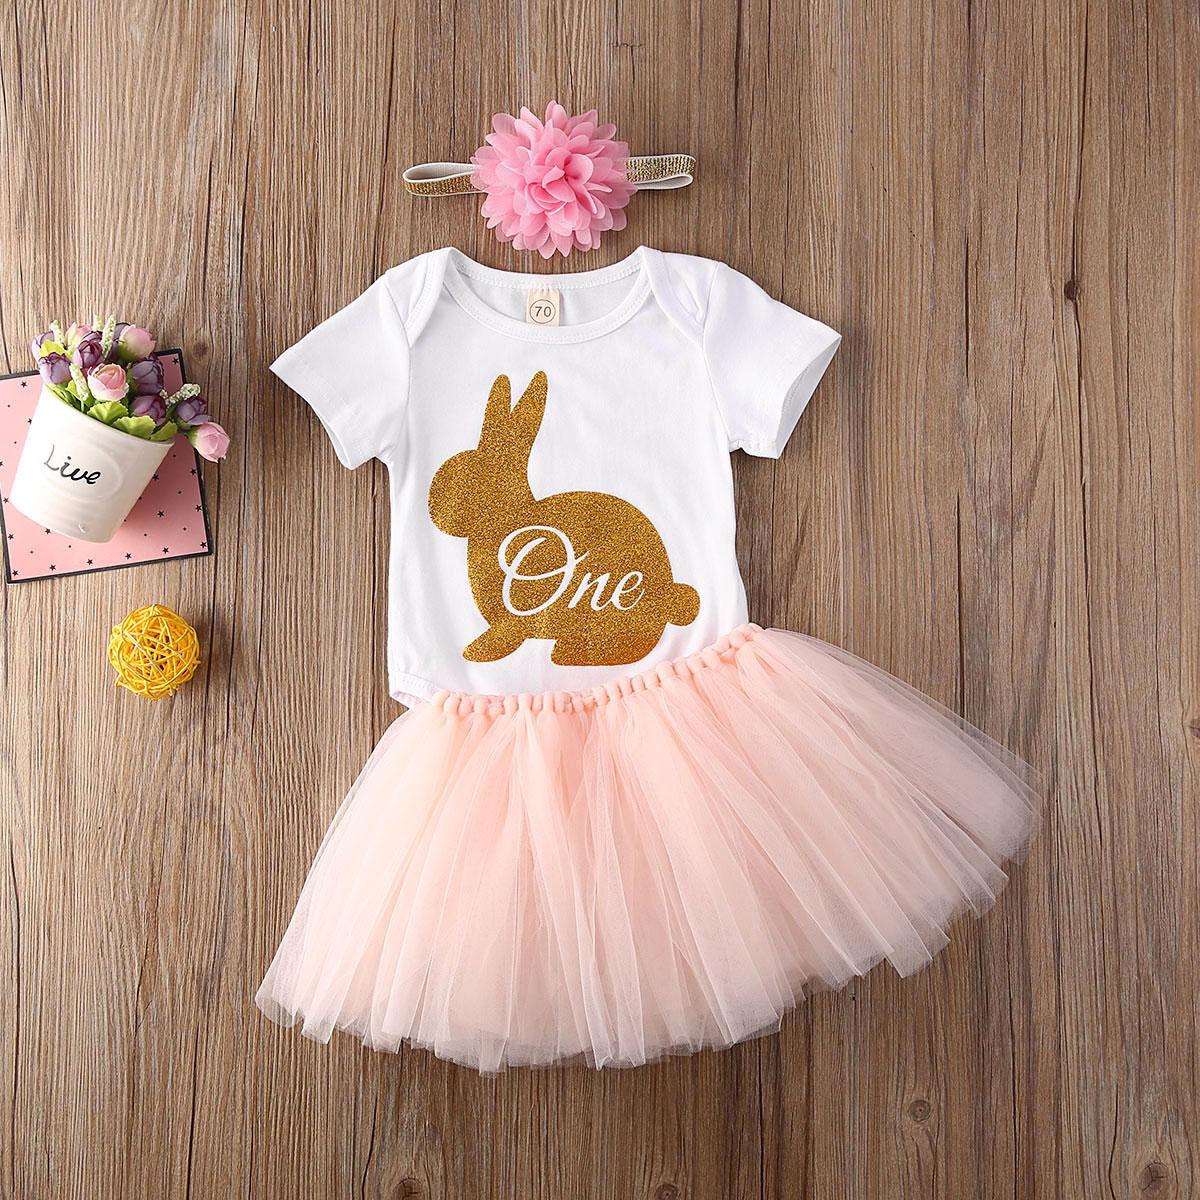 3PCS Baby Girl 1st Easter Outfit Party Rabbit Romper Cake Smash Tutu Dress